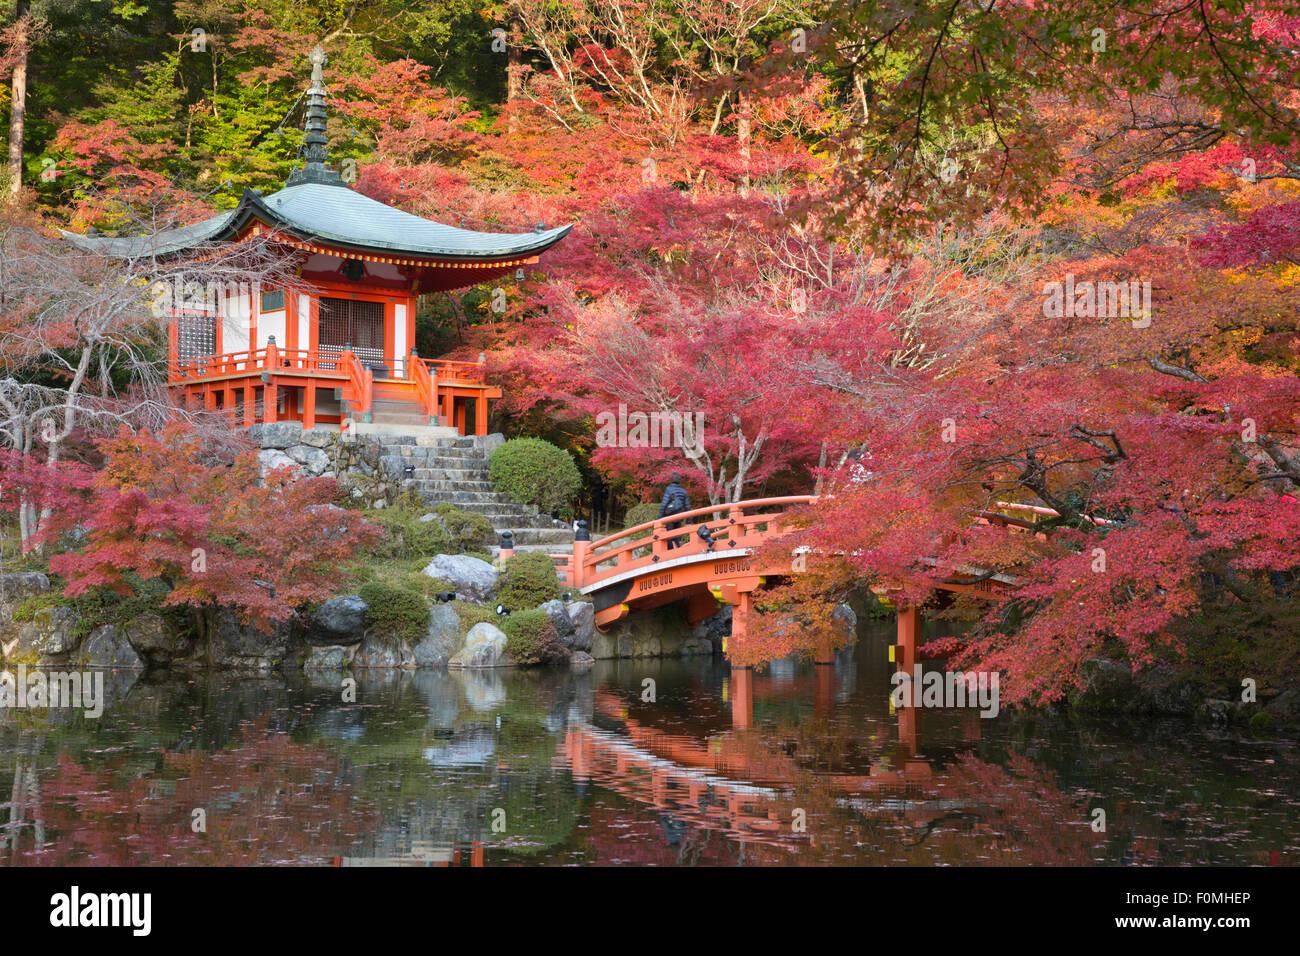 Japanese Temple Garden In Autumn Daigoji Temple Kyoto Japan